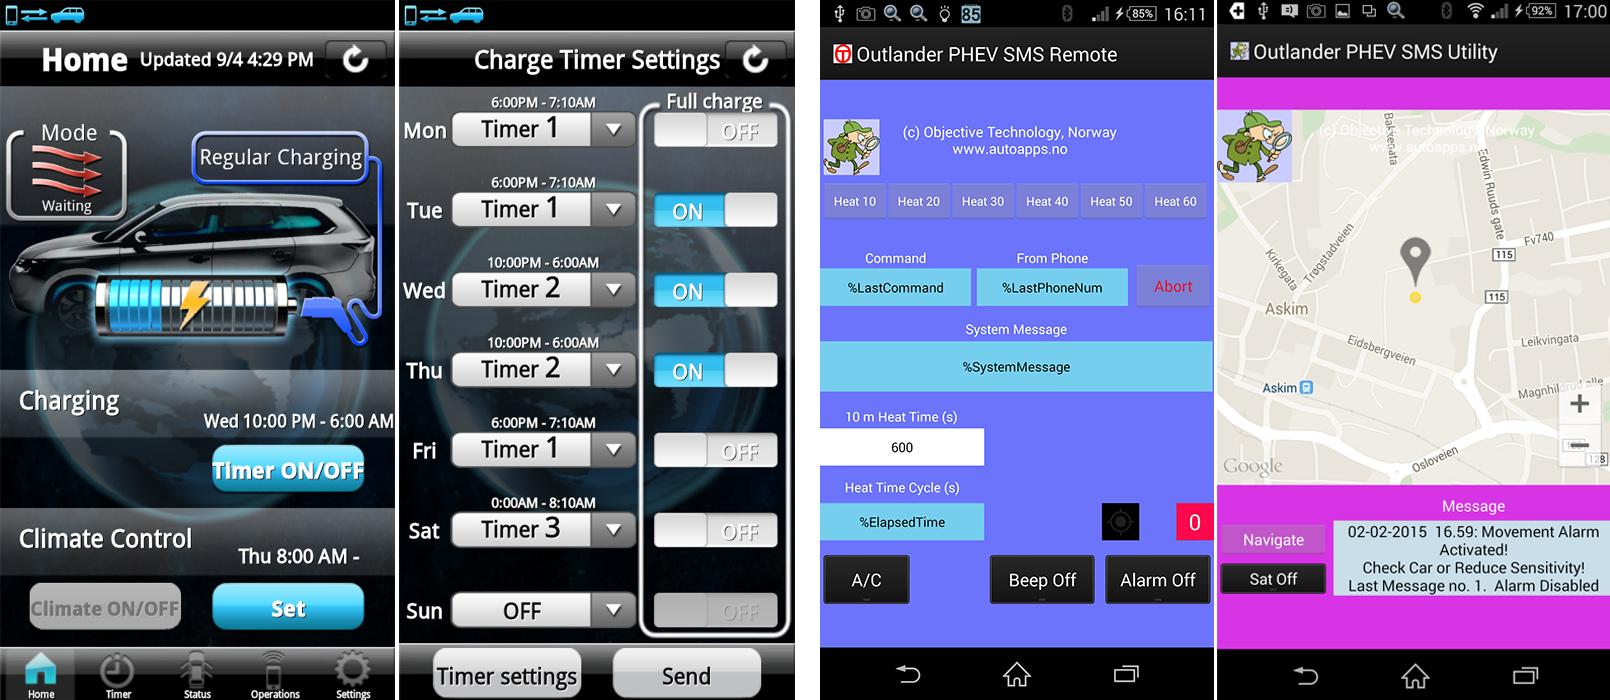 Outlander SMS remote Outlander remote app